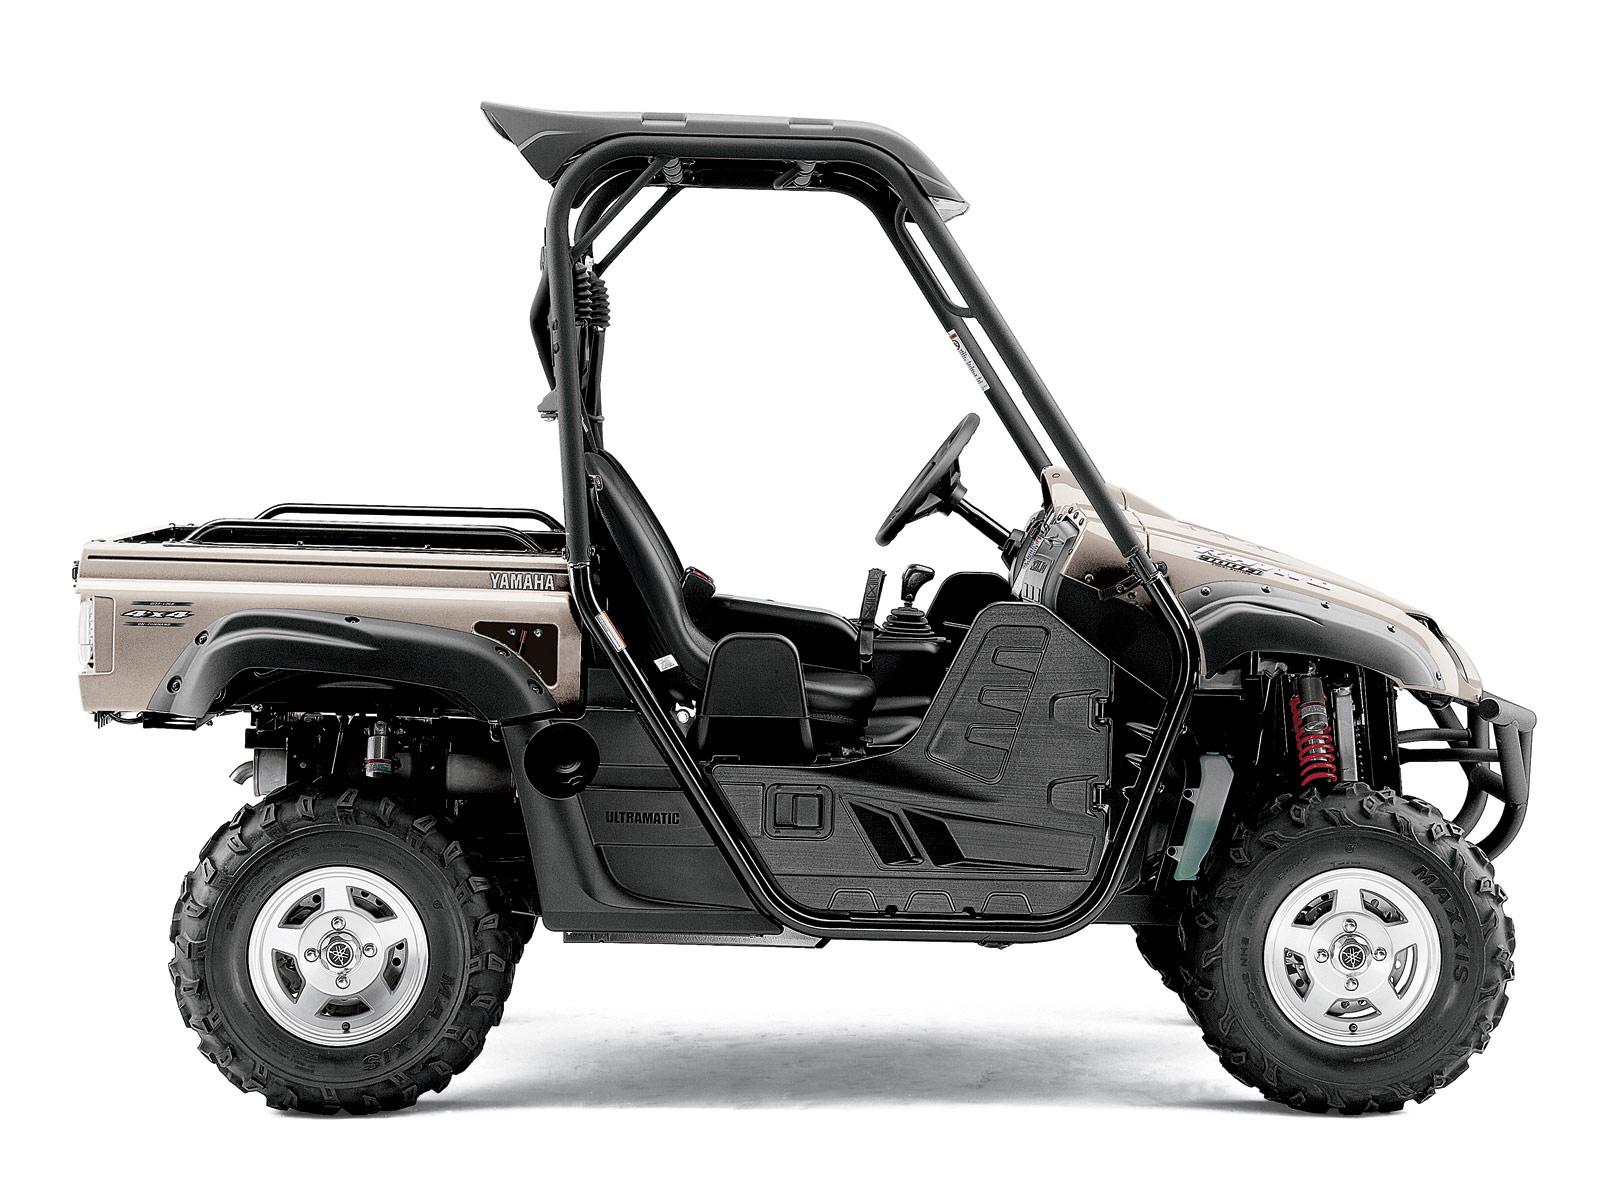 Rhino 700 FI Auto 4x4 Sport Edition Deluxe 2012 Yamaha ATV